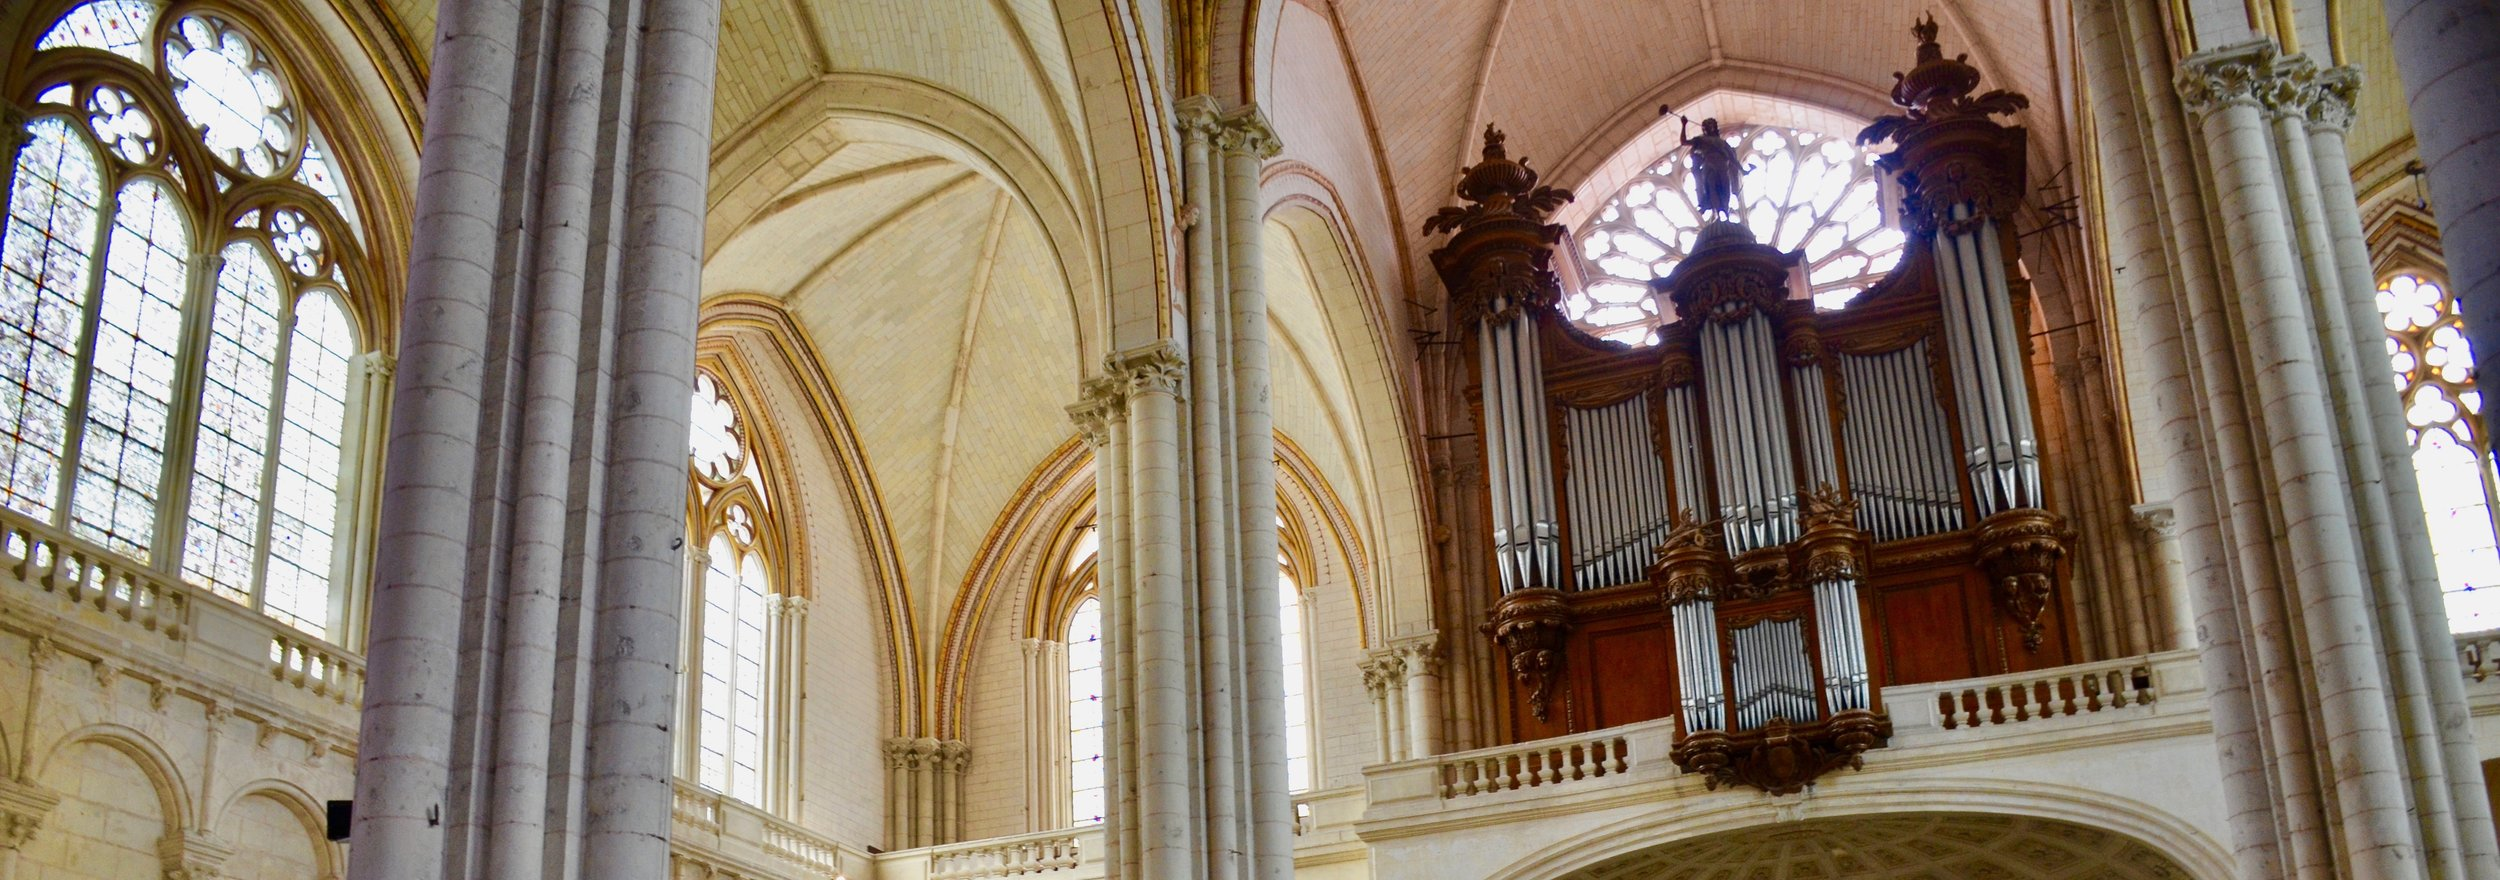 The Great Cliqout Organ - Boston Organ Studio